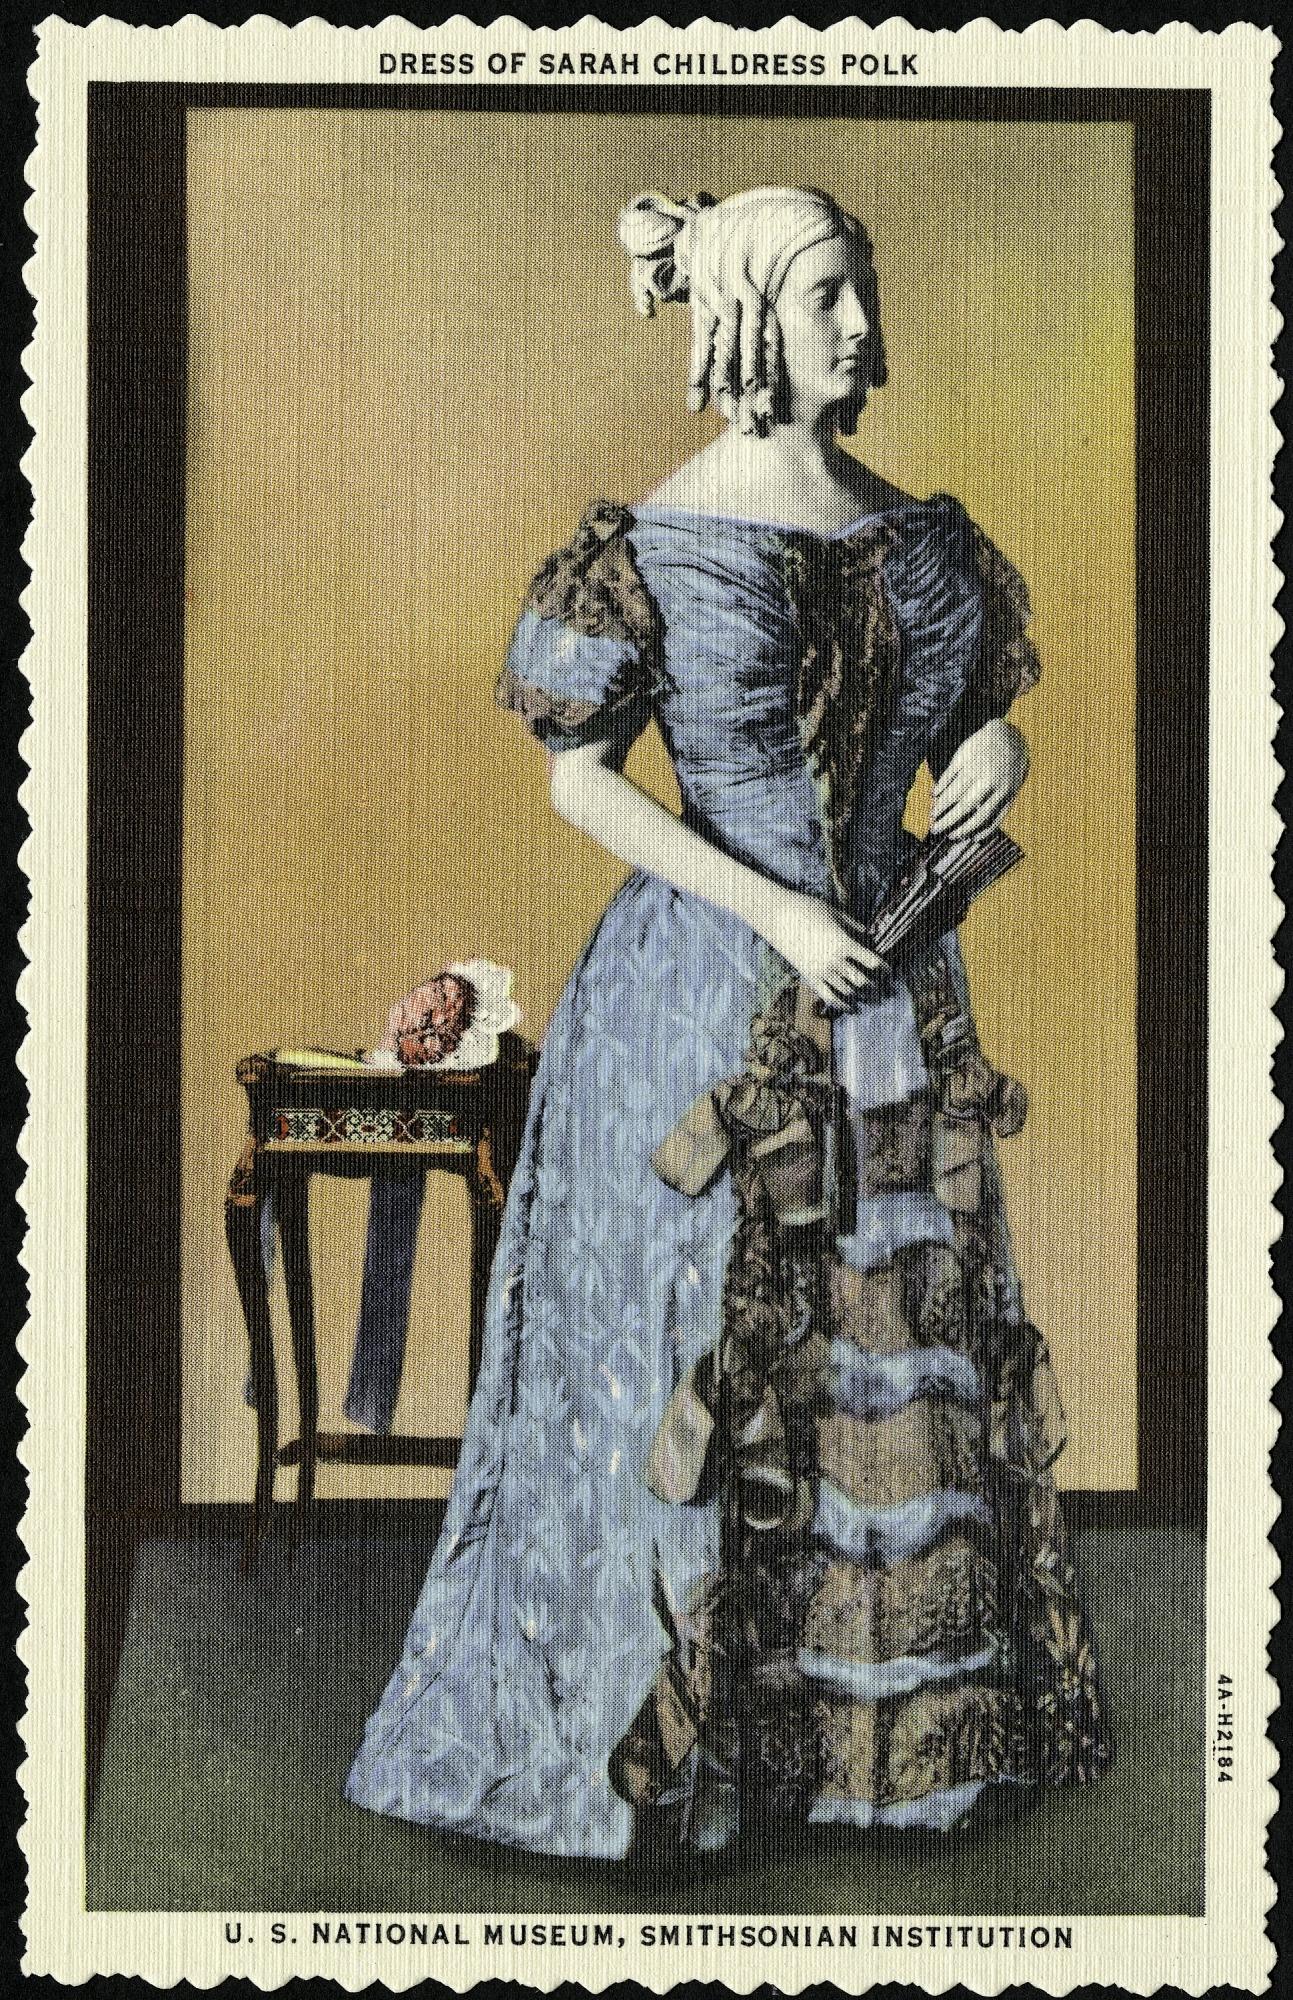 Postcard of a Dress of Sarah Childress Polk